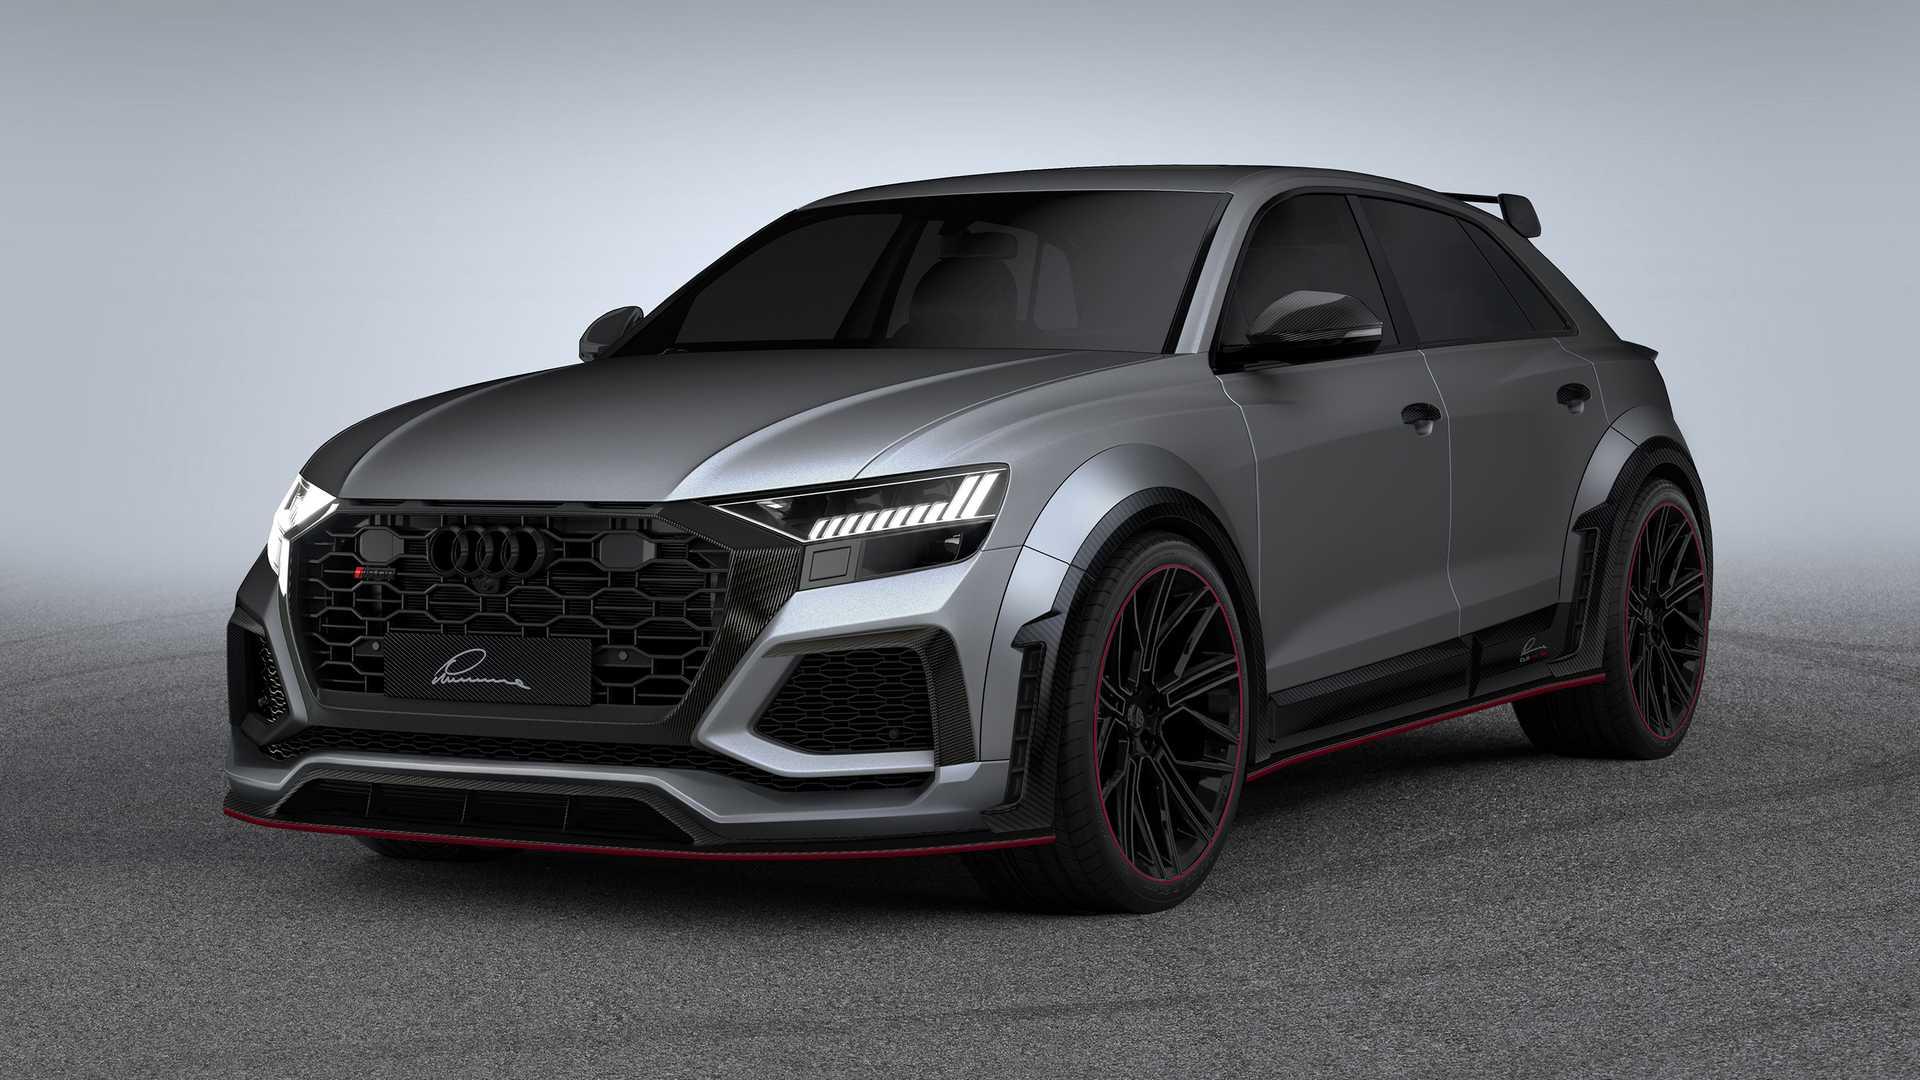 Audi-RS-Q8-CLR-8-RS-By-Lumma-Design-1